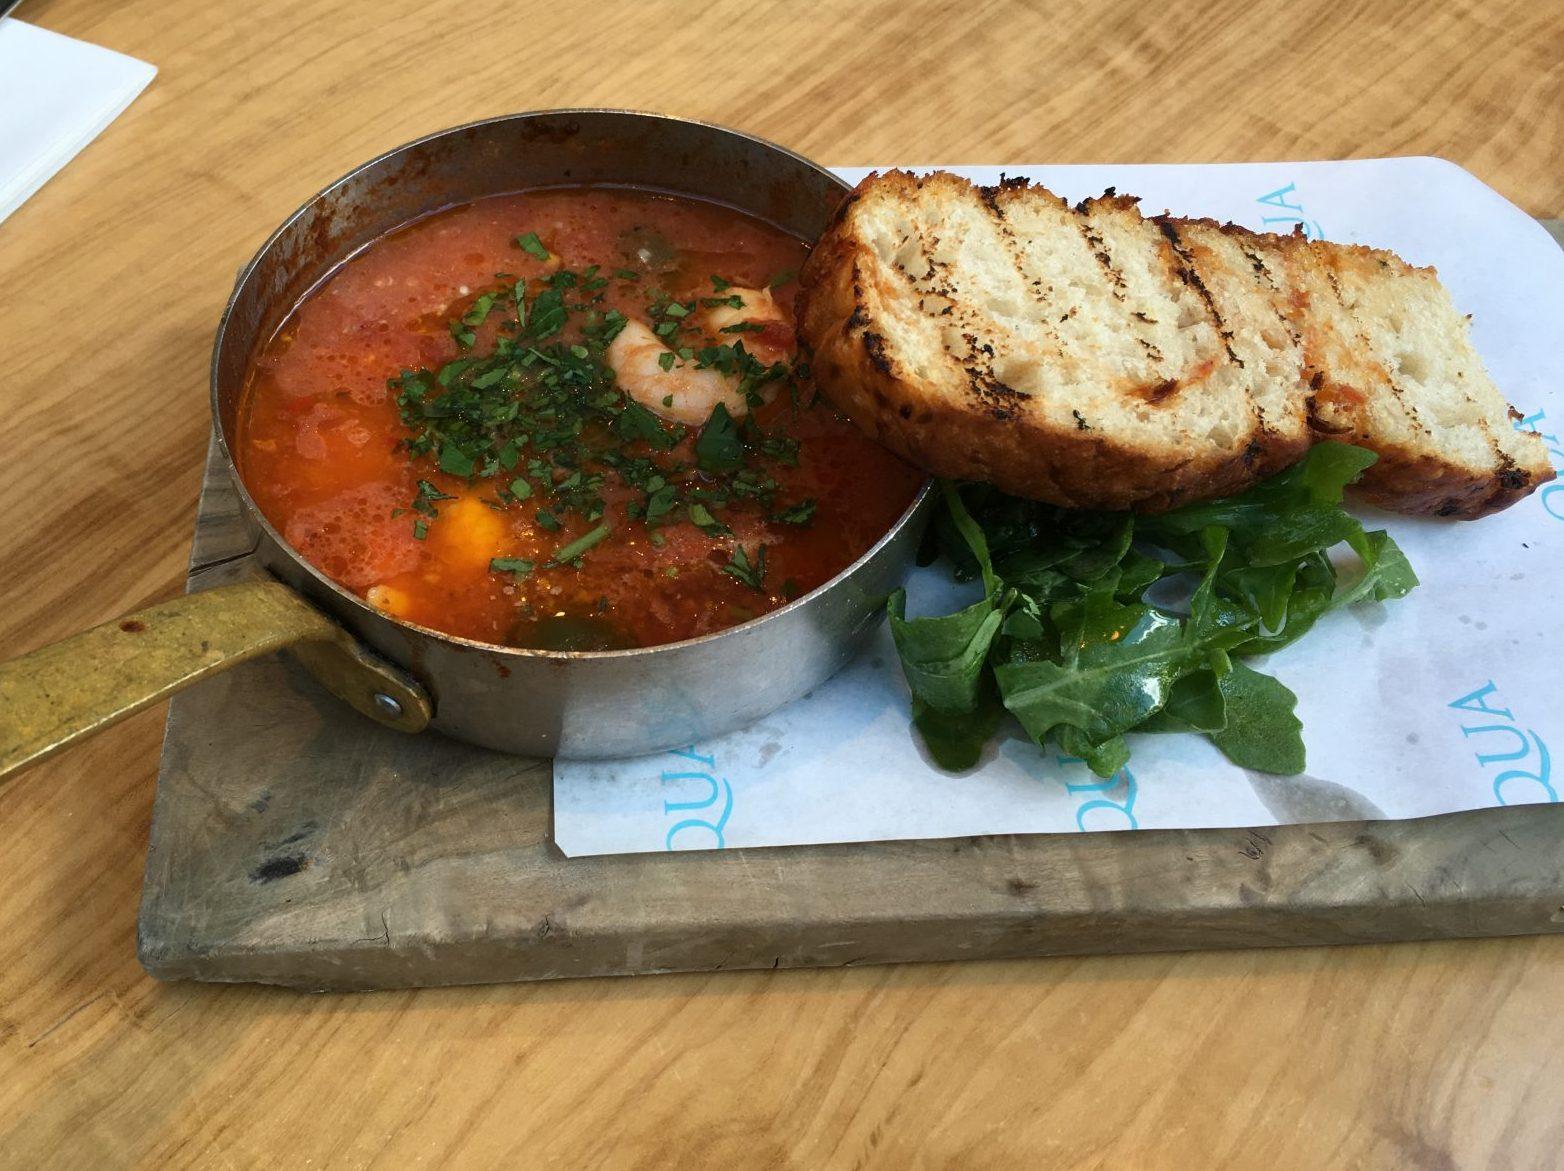 prawns in a tomato and garlic sauce